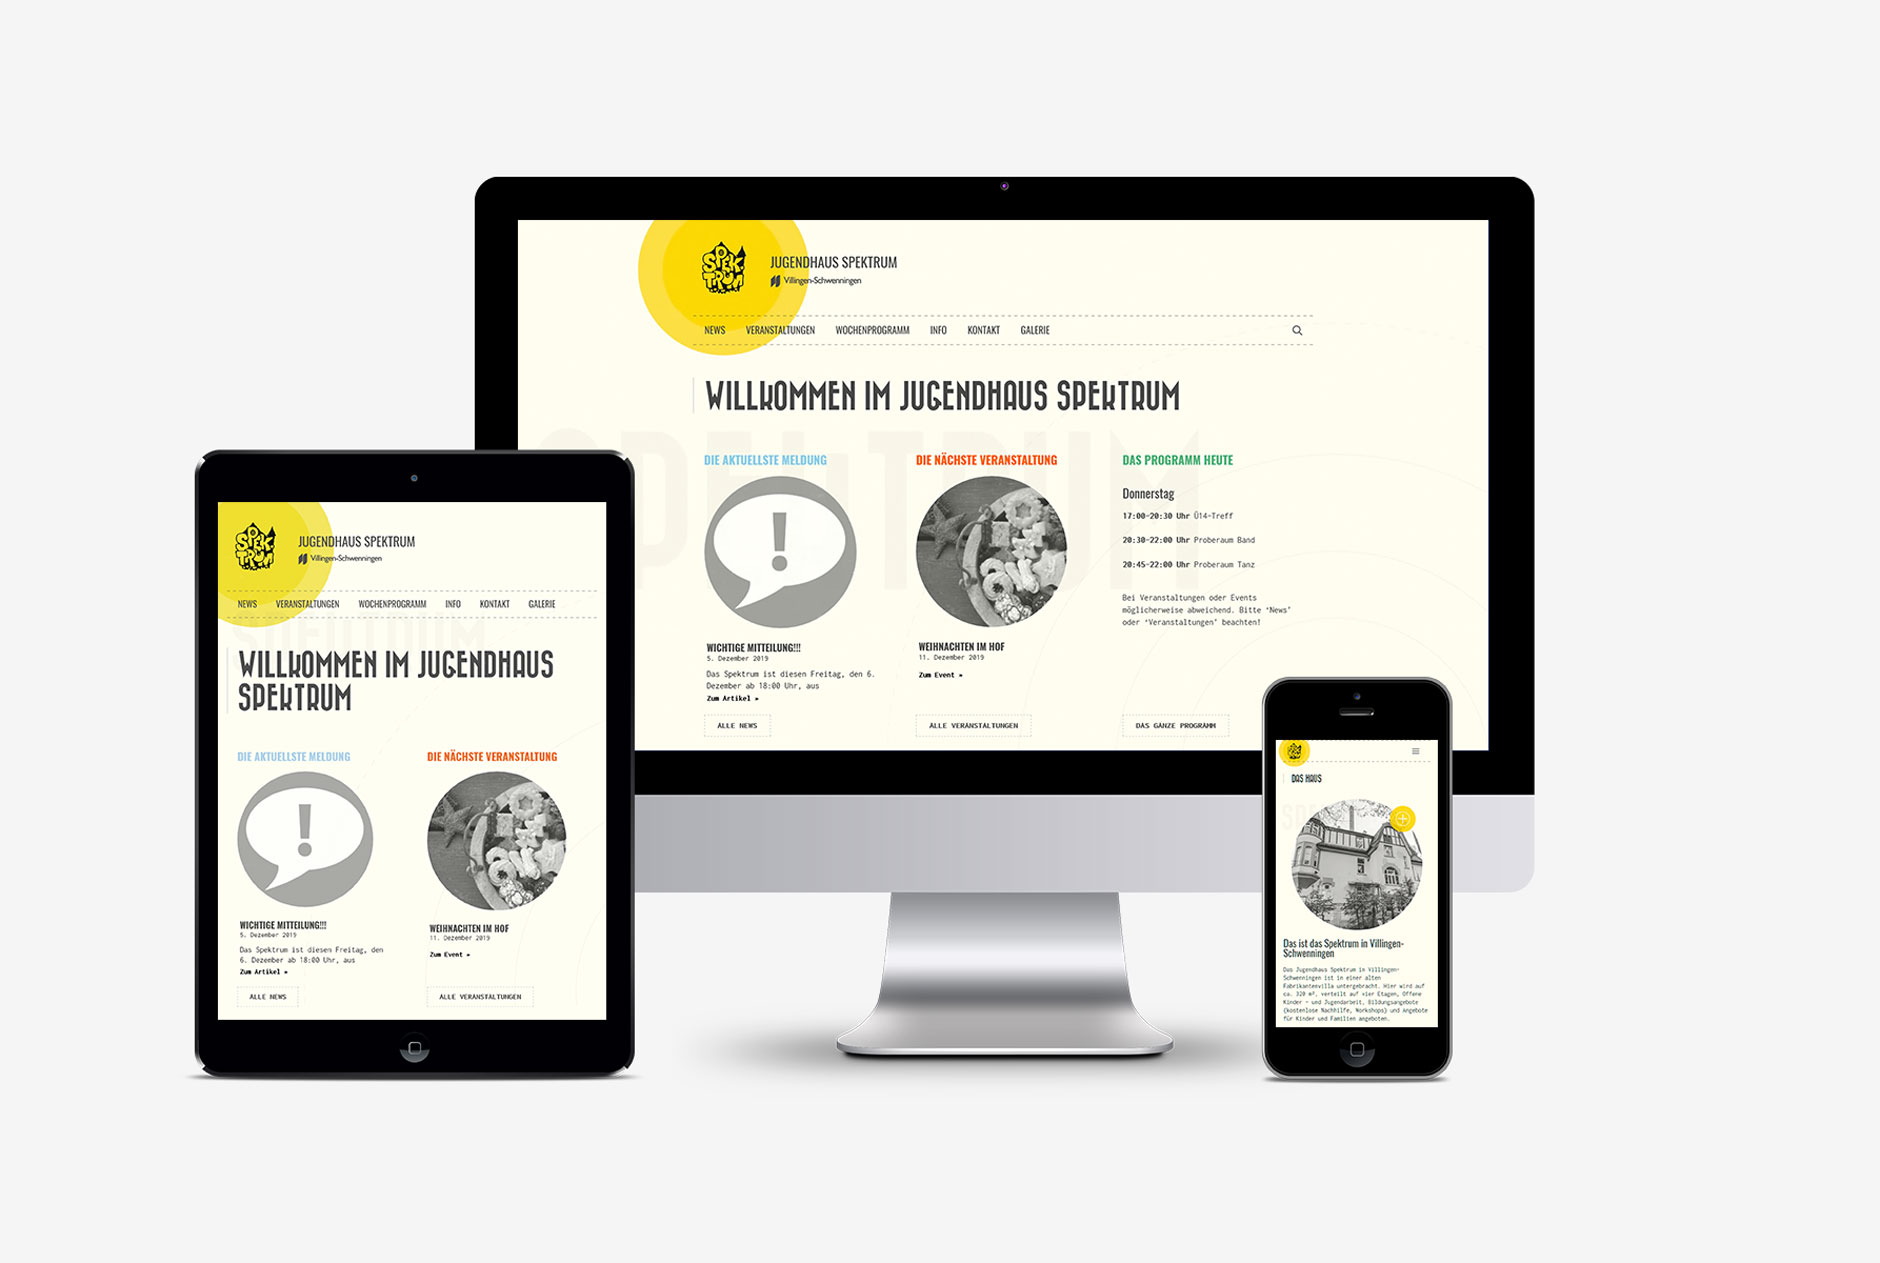 jugendhaus spektrum villingen schwenningen webdesign wordpress-Webdesign Jugendhaus Spektrum